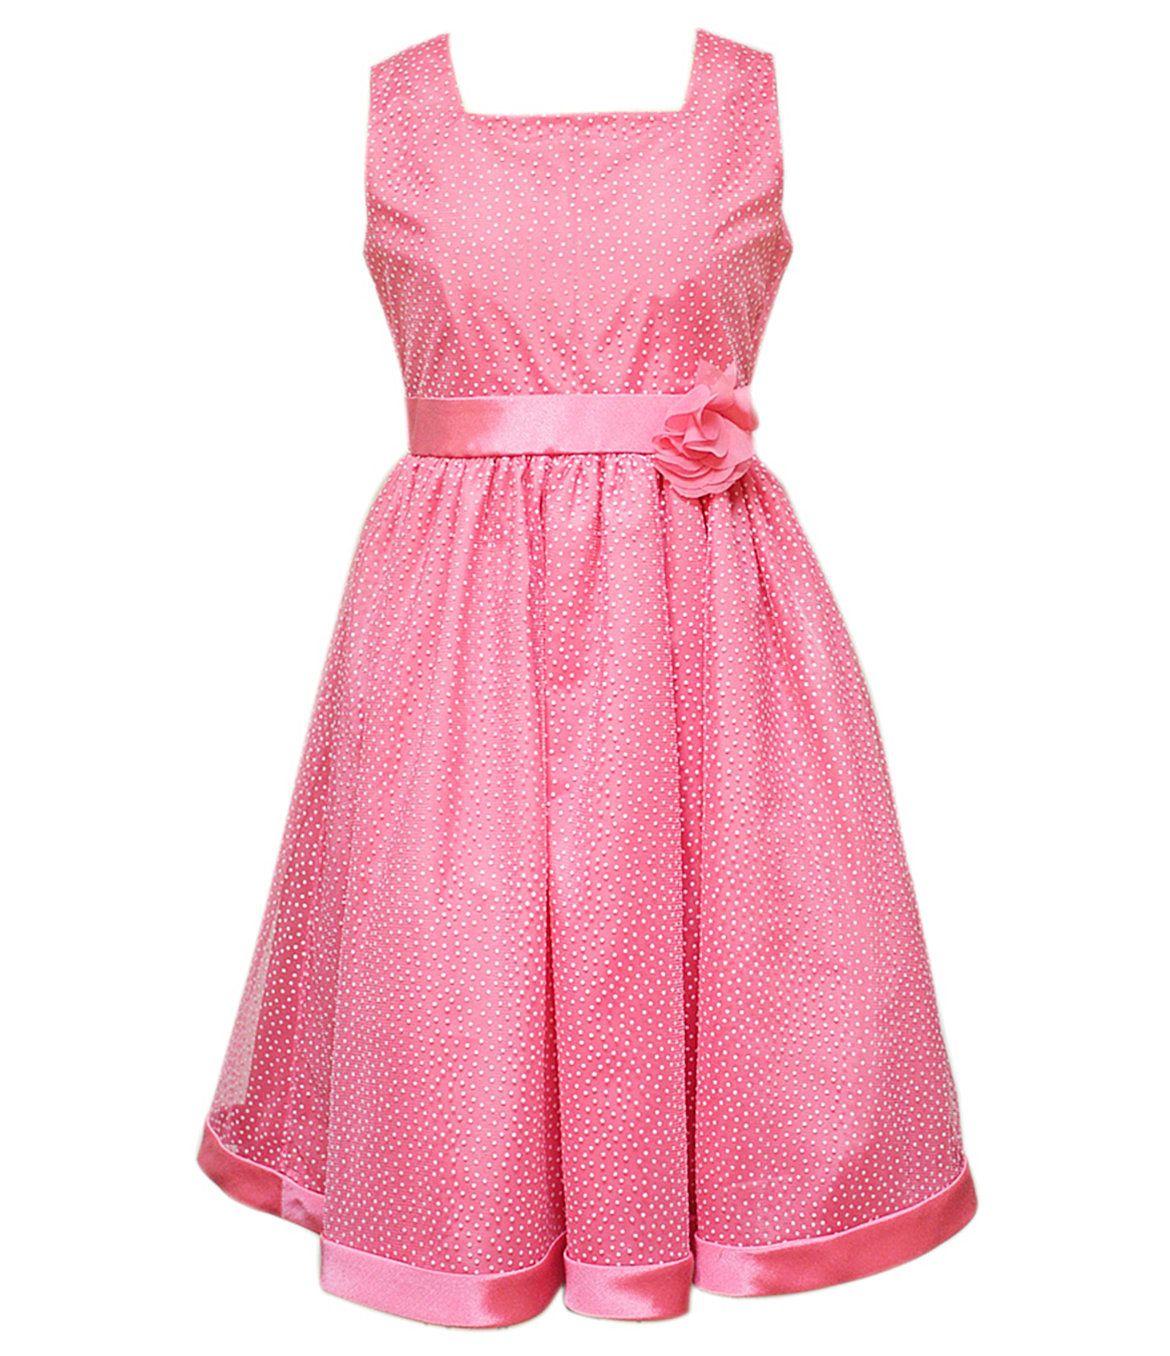 Jarrah Gioconda, totally cute! | Clothing | Pinterest